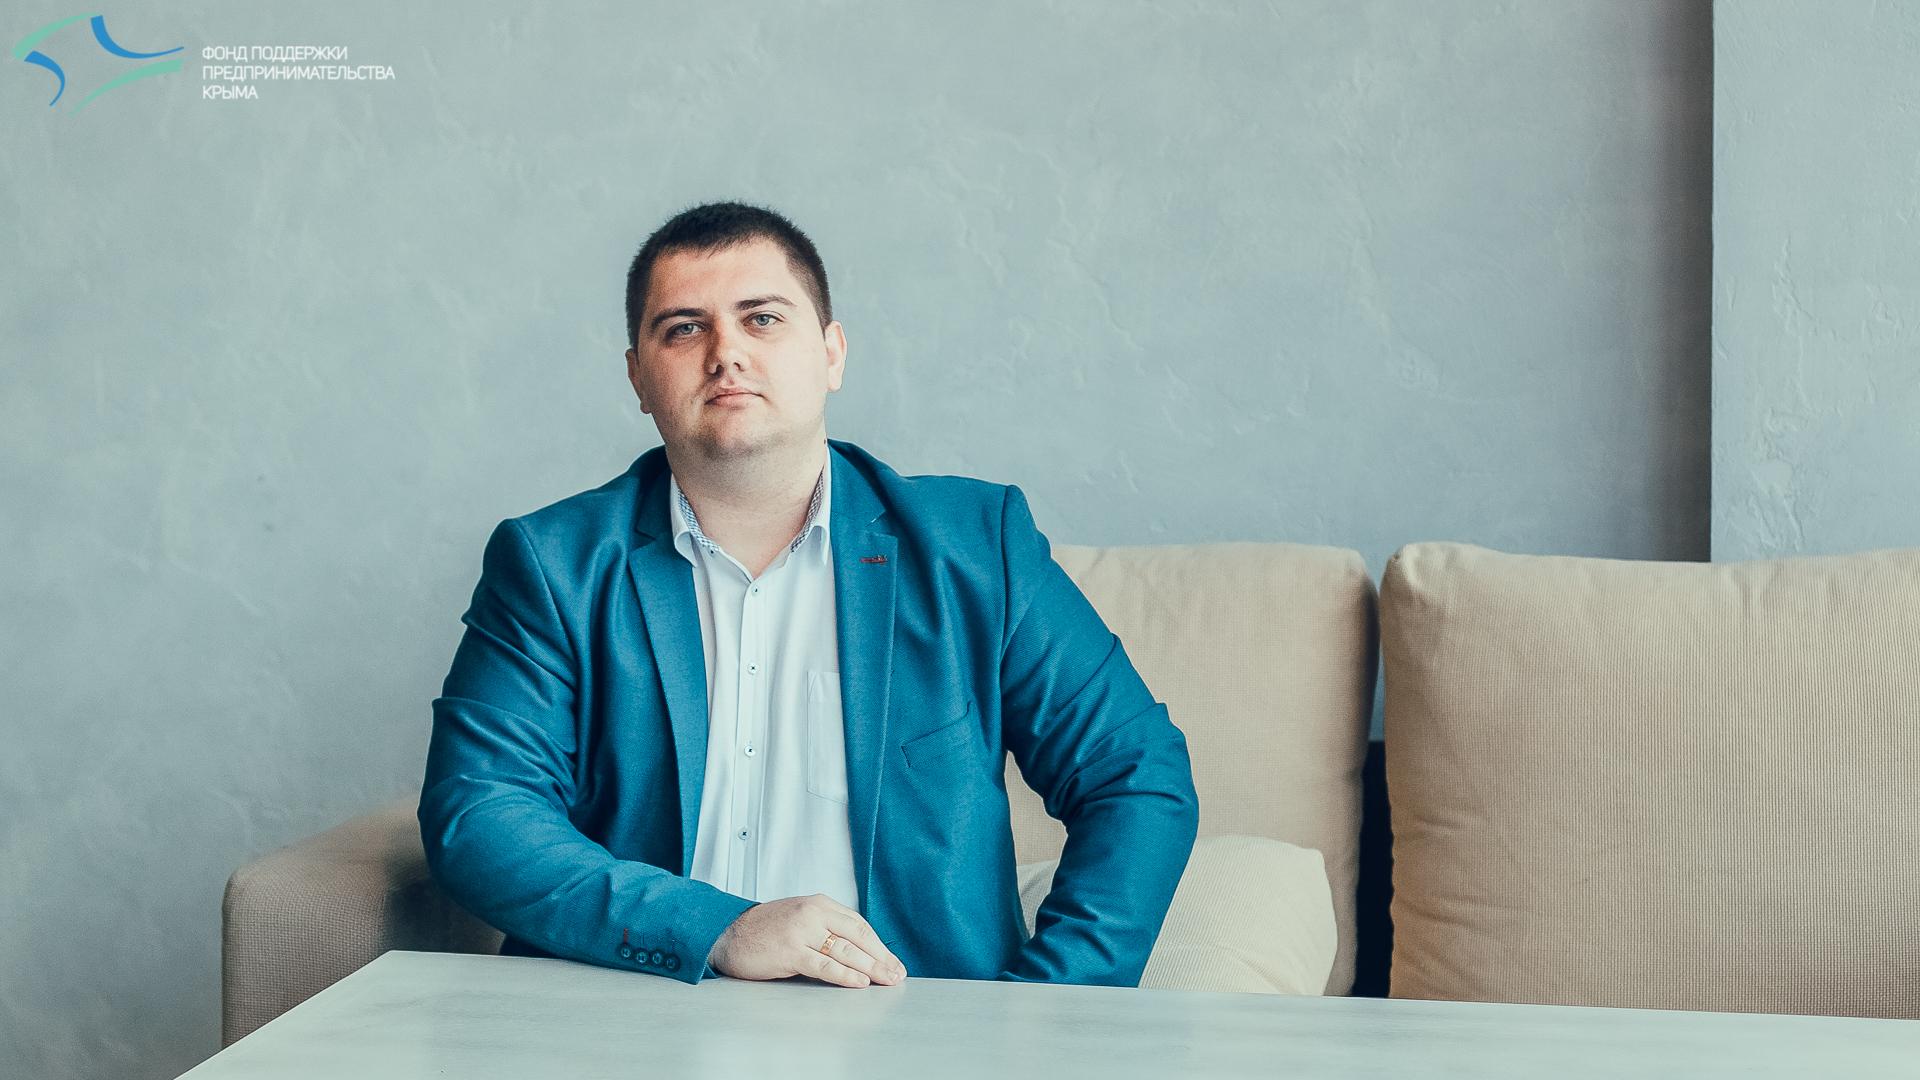 европа анатолий тарасенко футболист фото альтернативные